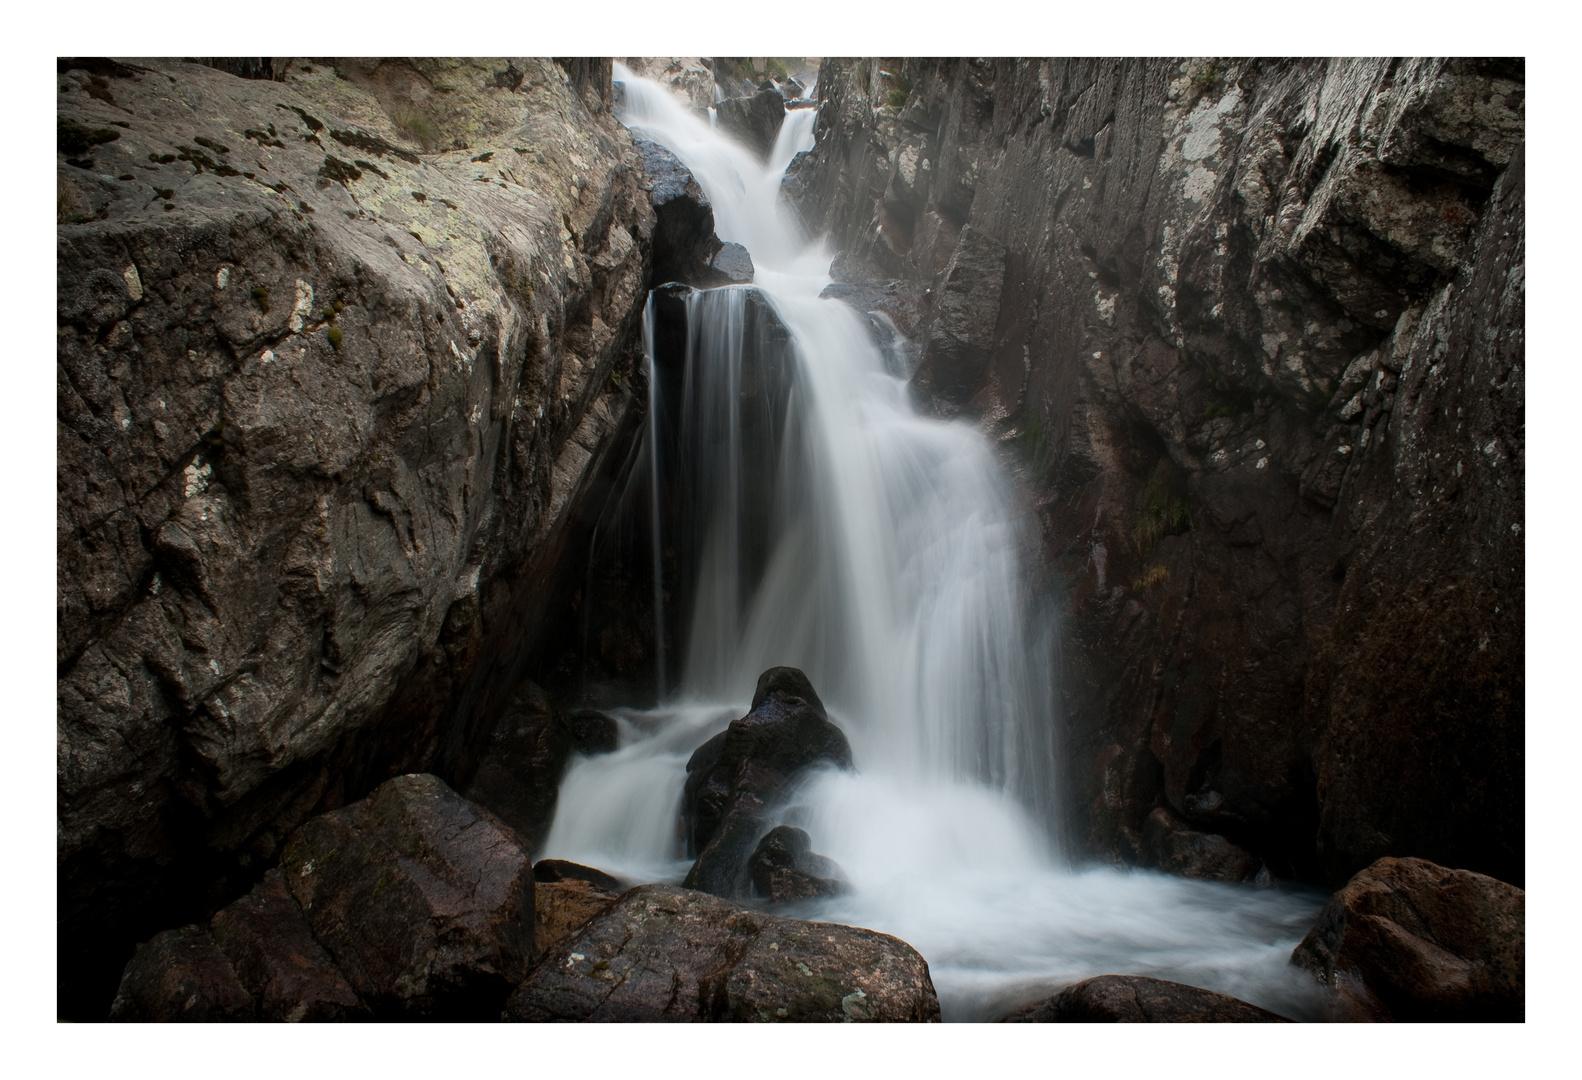 Cascade - Mercantour - Vallee des merveilles 2009